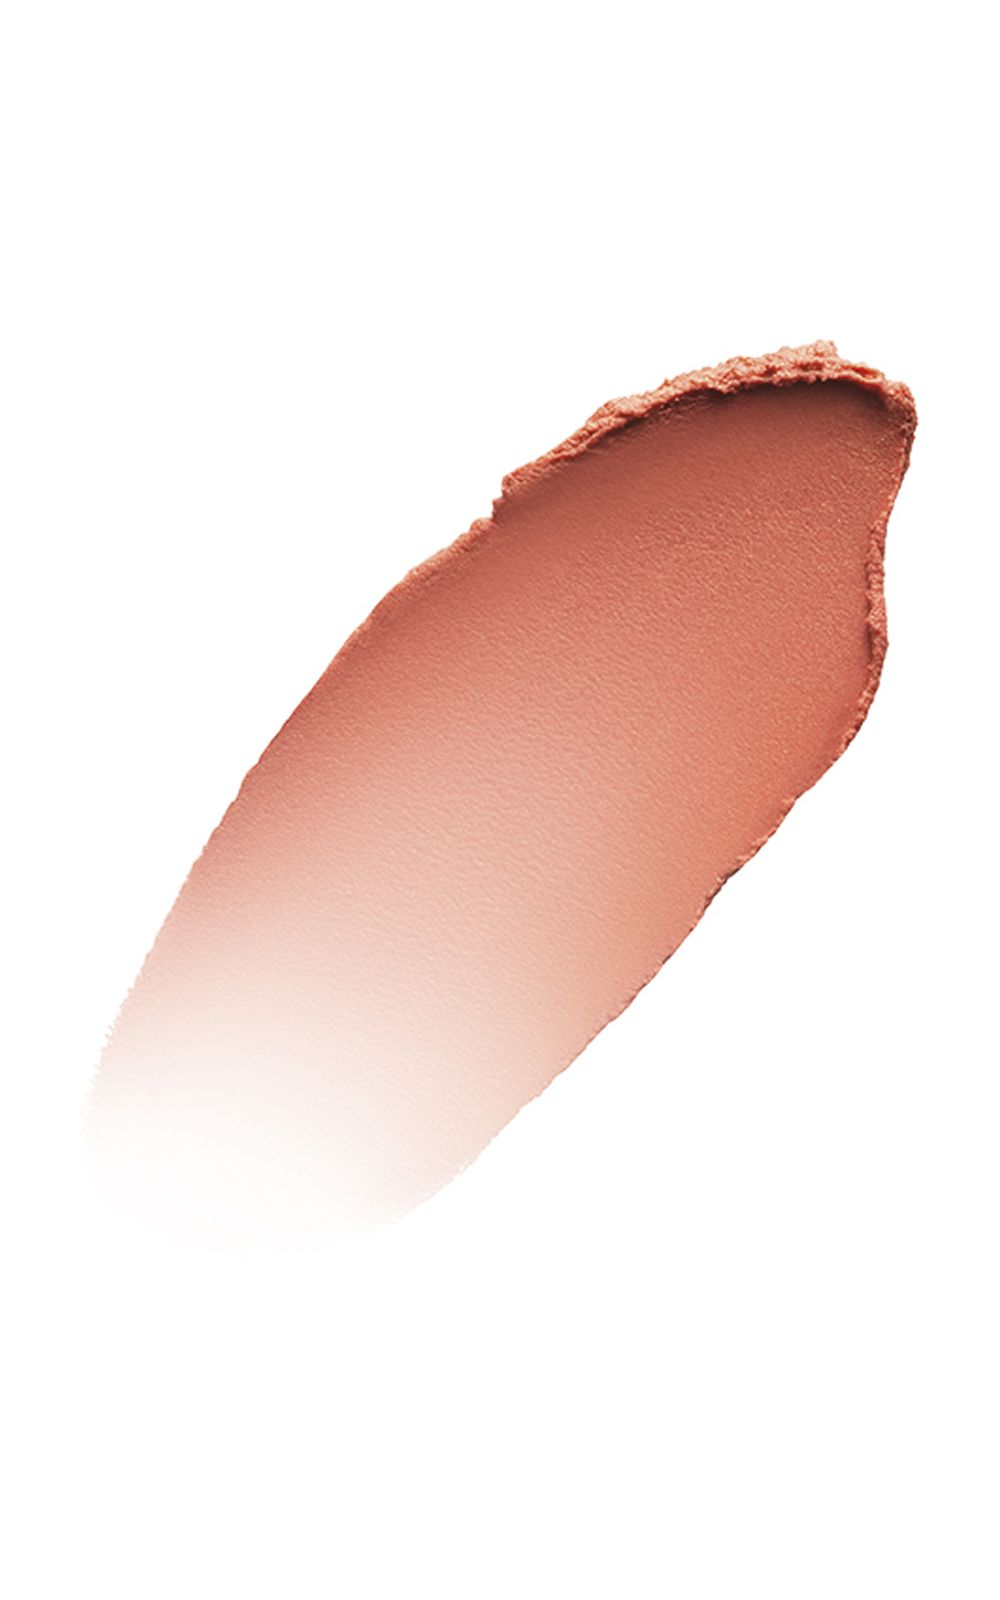 Foto 3 - Blush em Mousse Shiseido - Minimalist WhippedPowder - 03 Momoko